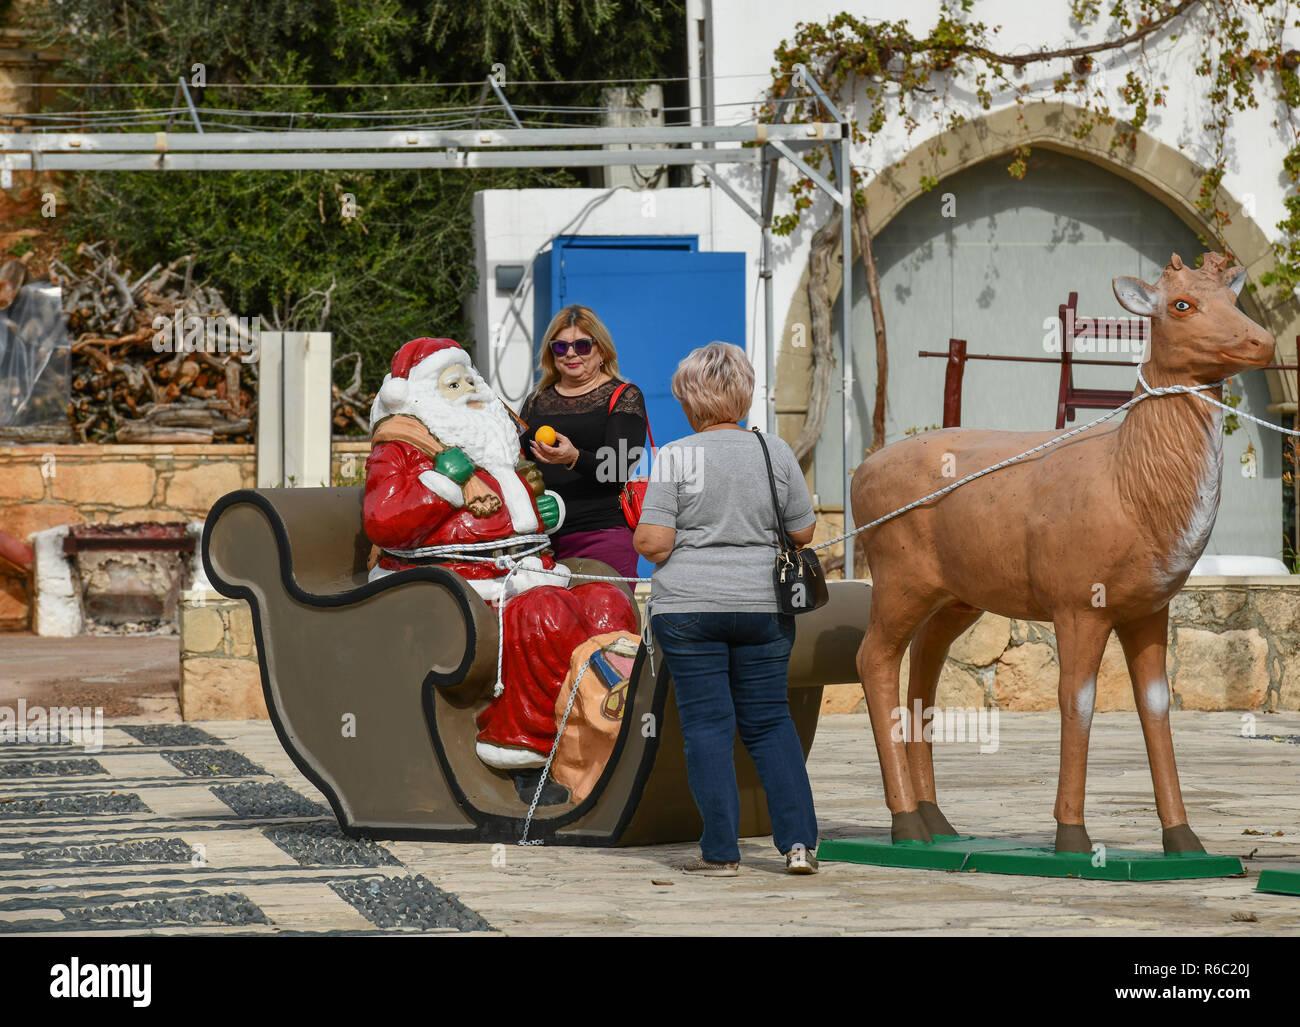 Christmas decoration, Agia Napa, republic Cyprus, Weihnachtsdekoration, Republik Zypern Stock Photo